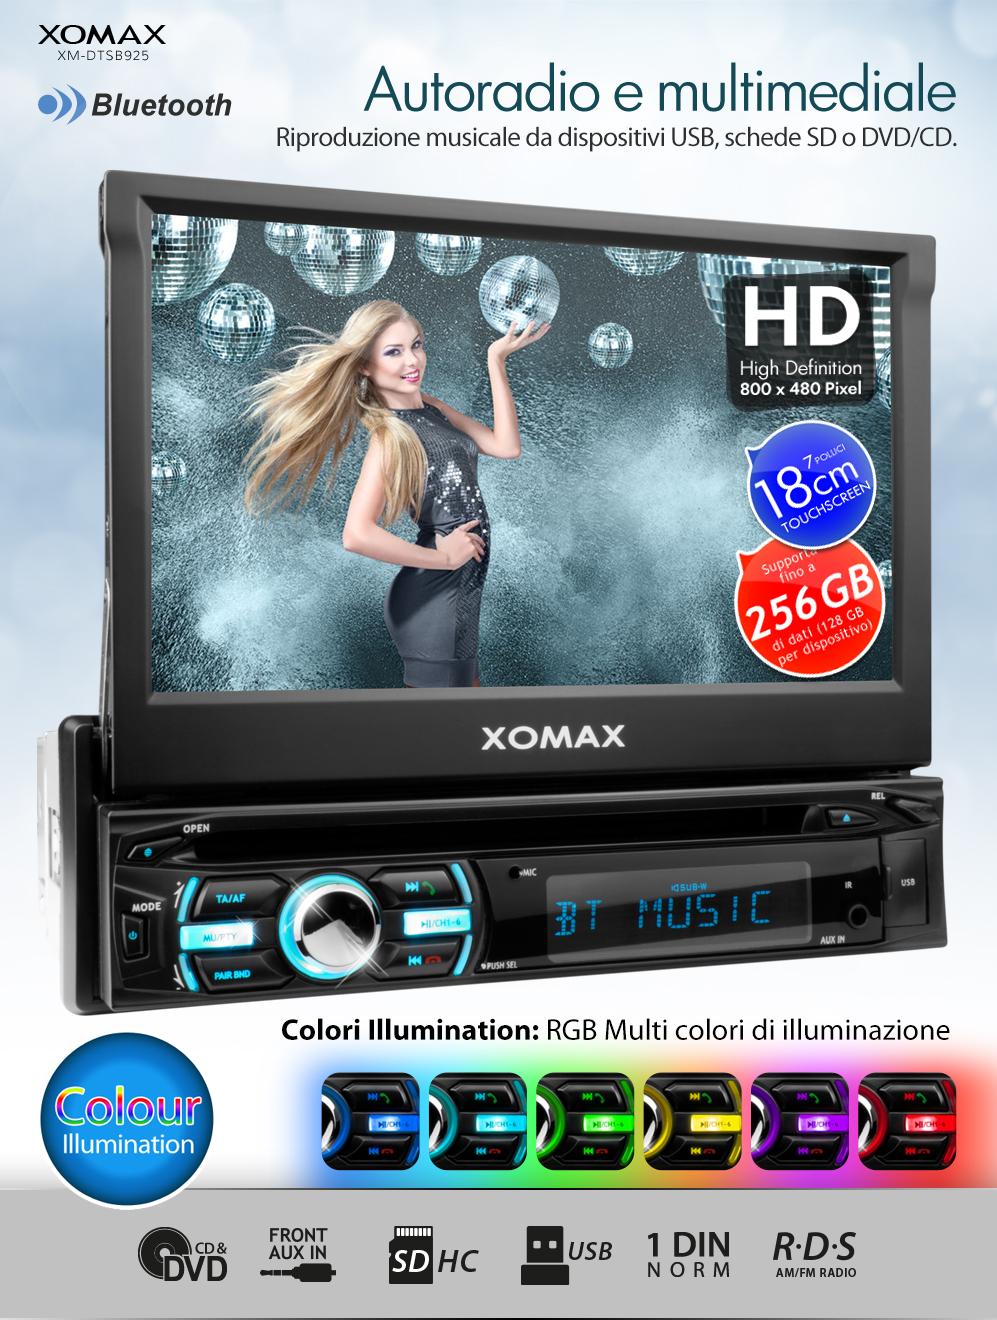 autoradio con bluetooth 18cm touchscreen dvd cd player usb. Black Bedroom Furniture Sets. Home Design Ideas